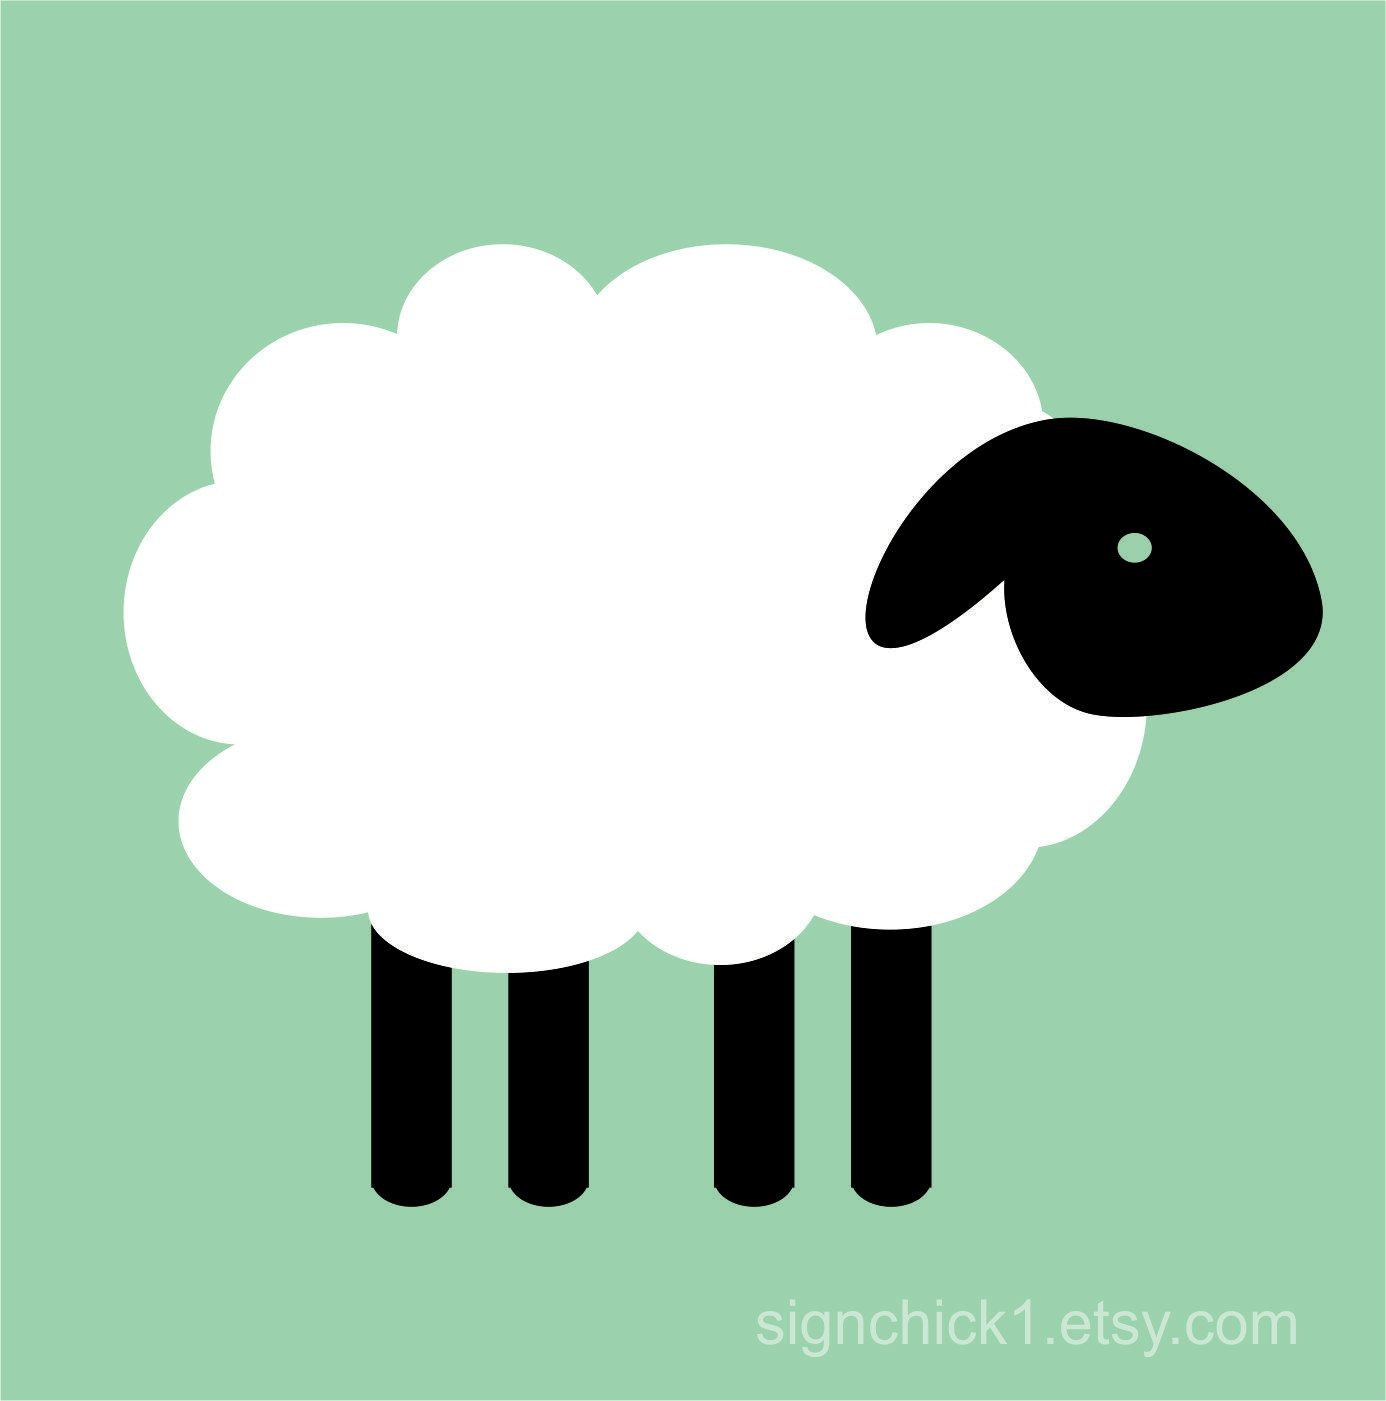 Sheep wall decals - set of 4. $25.00, via Etsy.